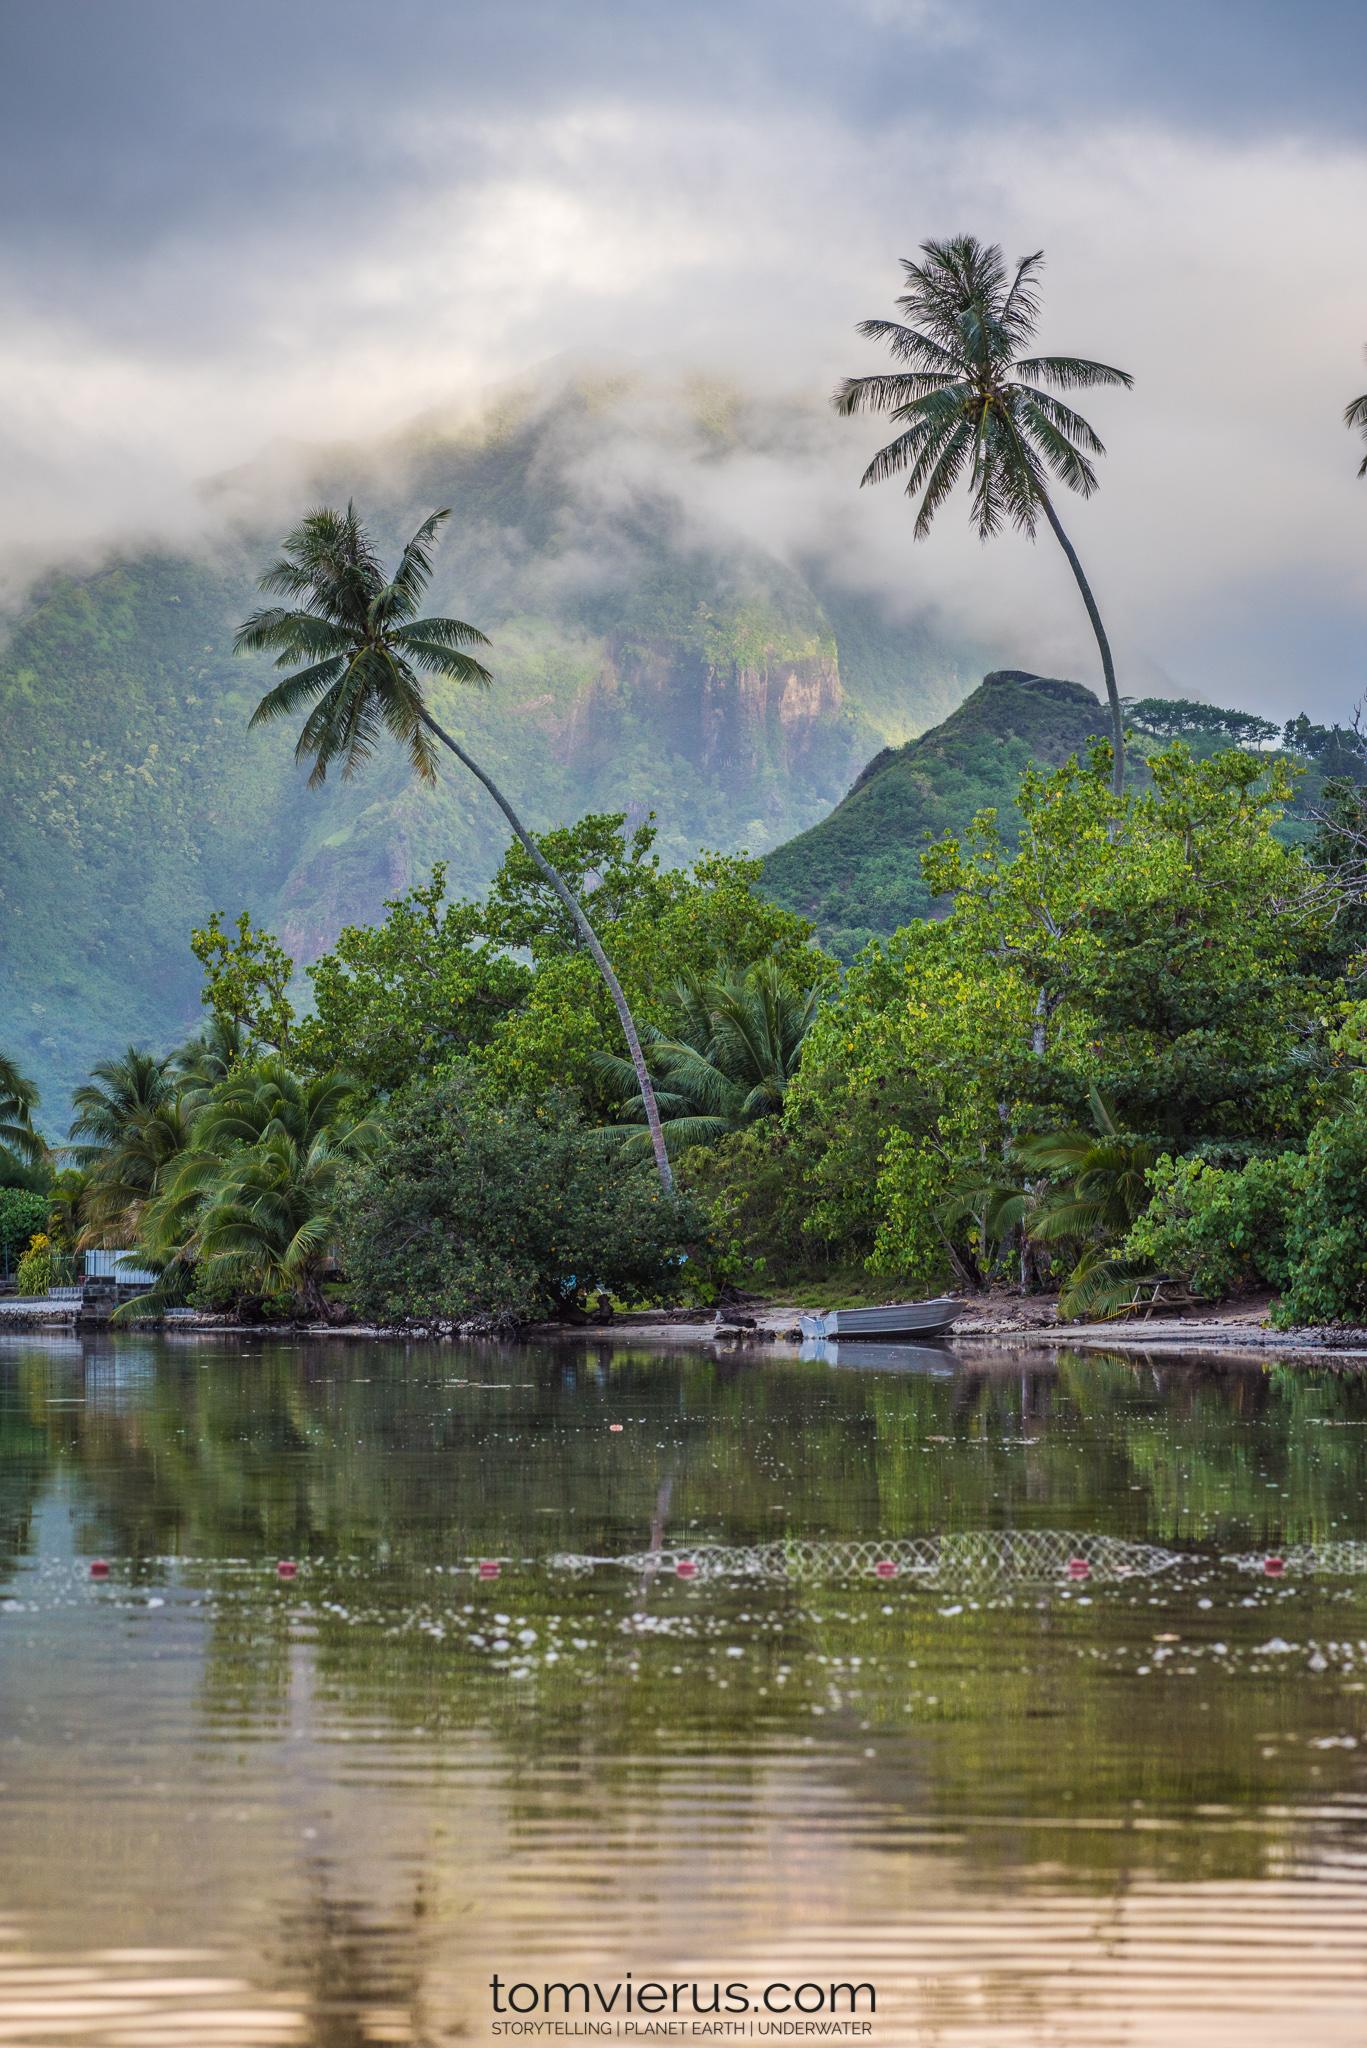 Fieldwork, Palms, Ocean, Scenic, Tropics